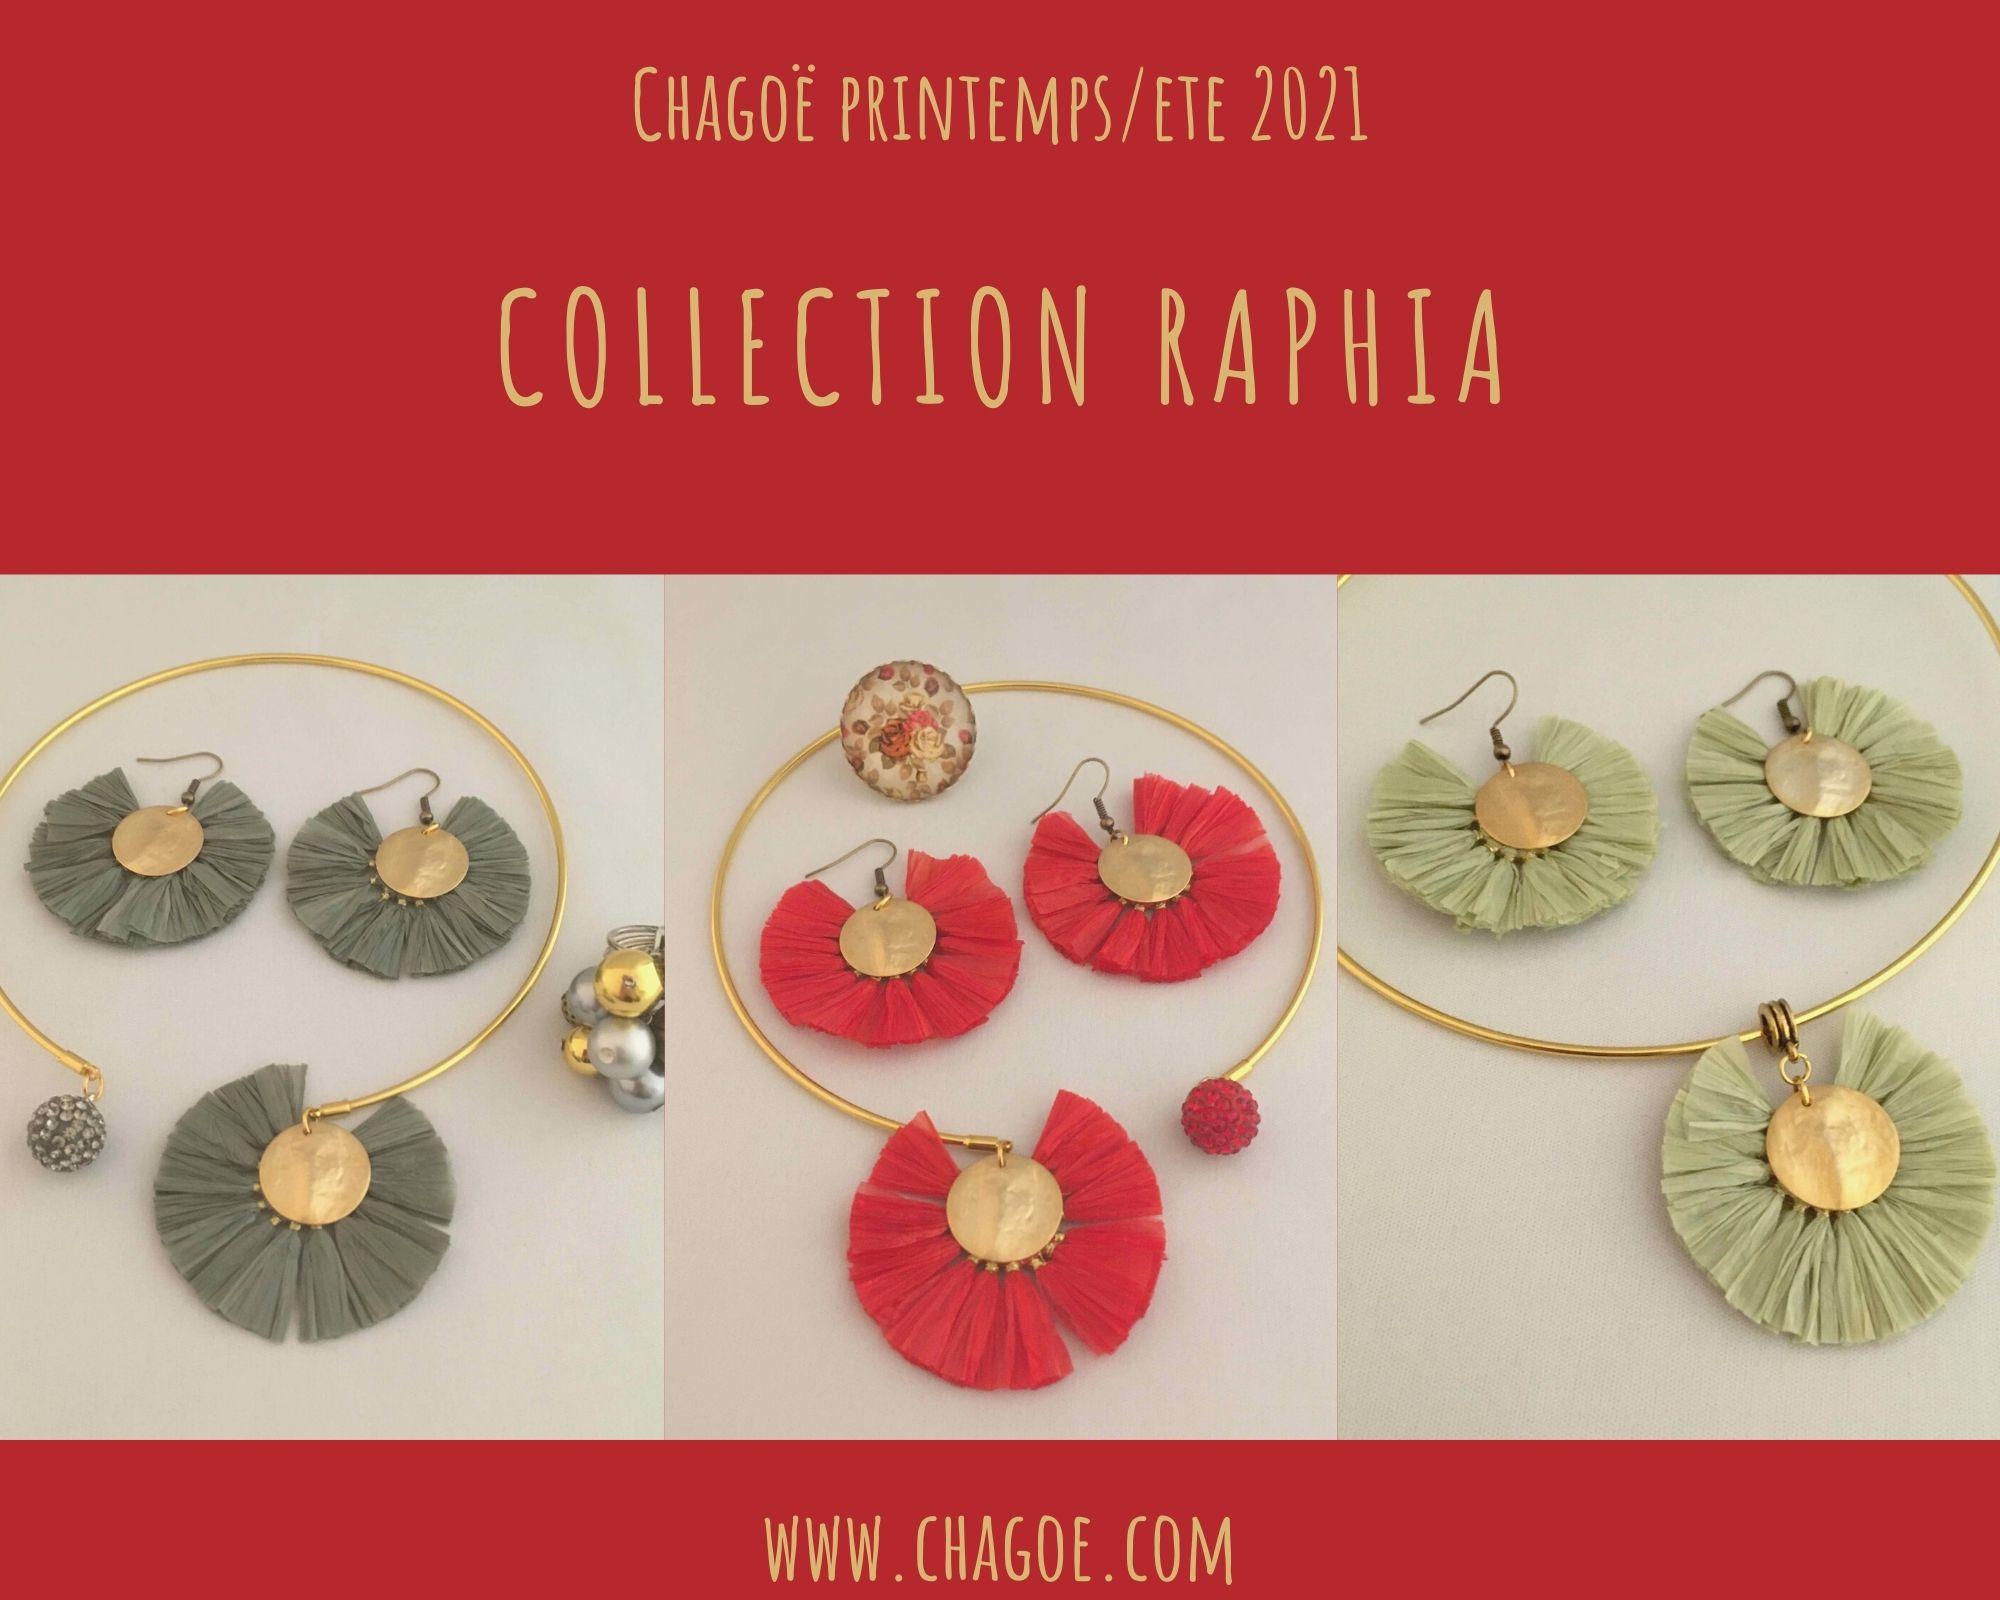 Collection RAPHIA Chagoë 2021